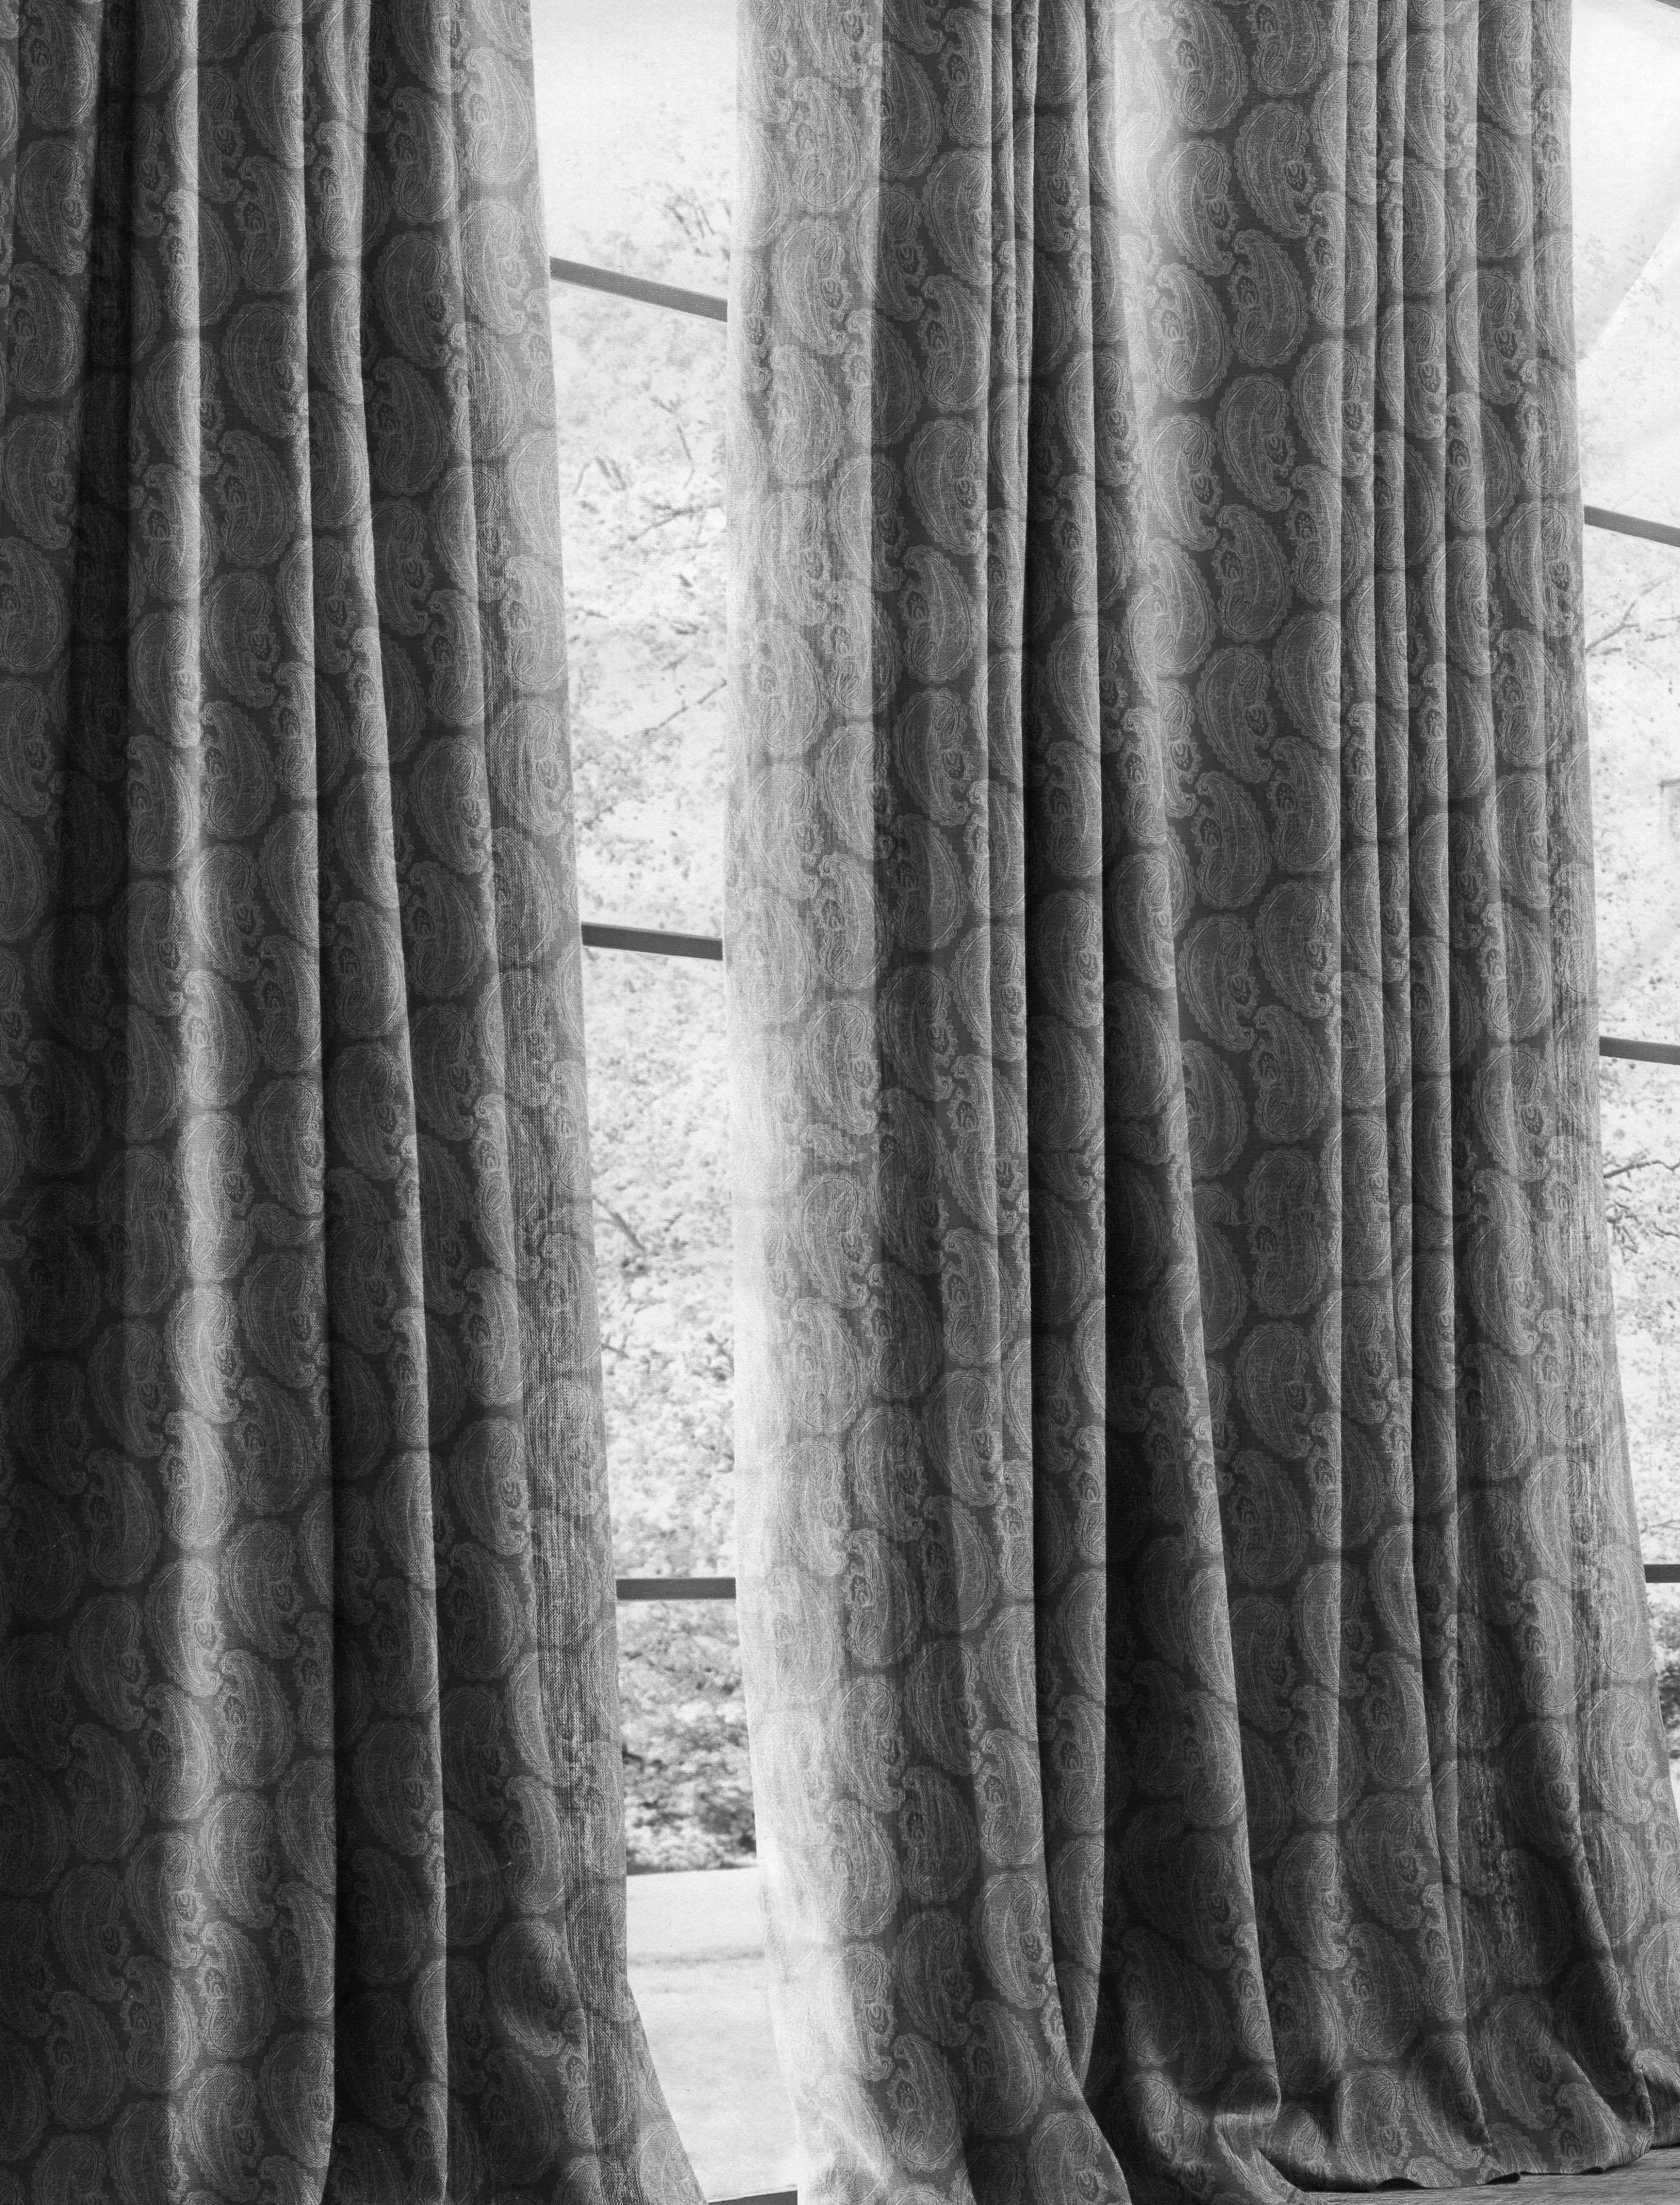 paisley curtains.jpg